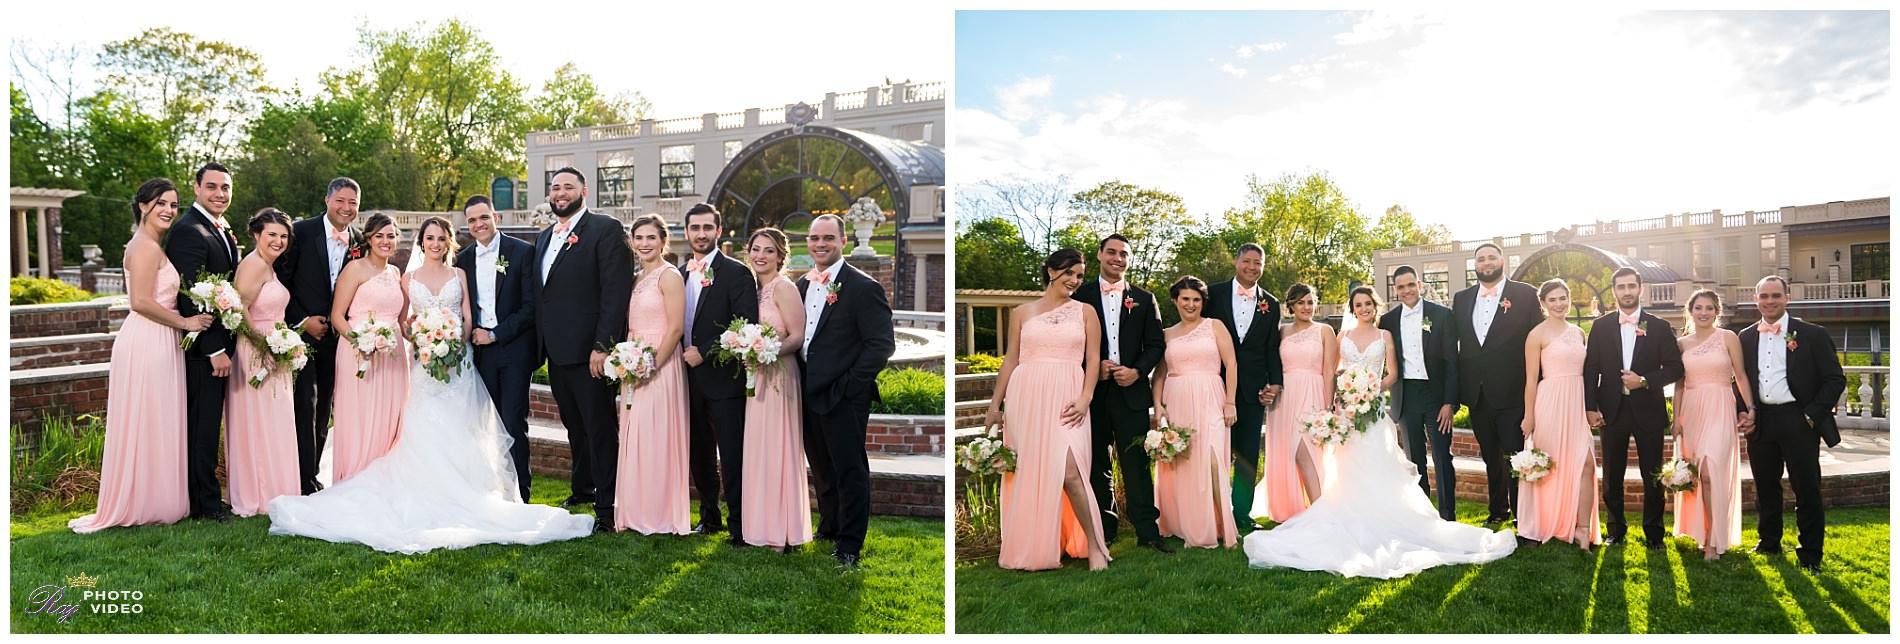 The-Manor-West-Orange-NJ-Wedding-Reception-Yanet-Jose-8.jpg